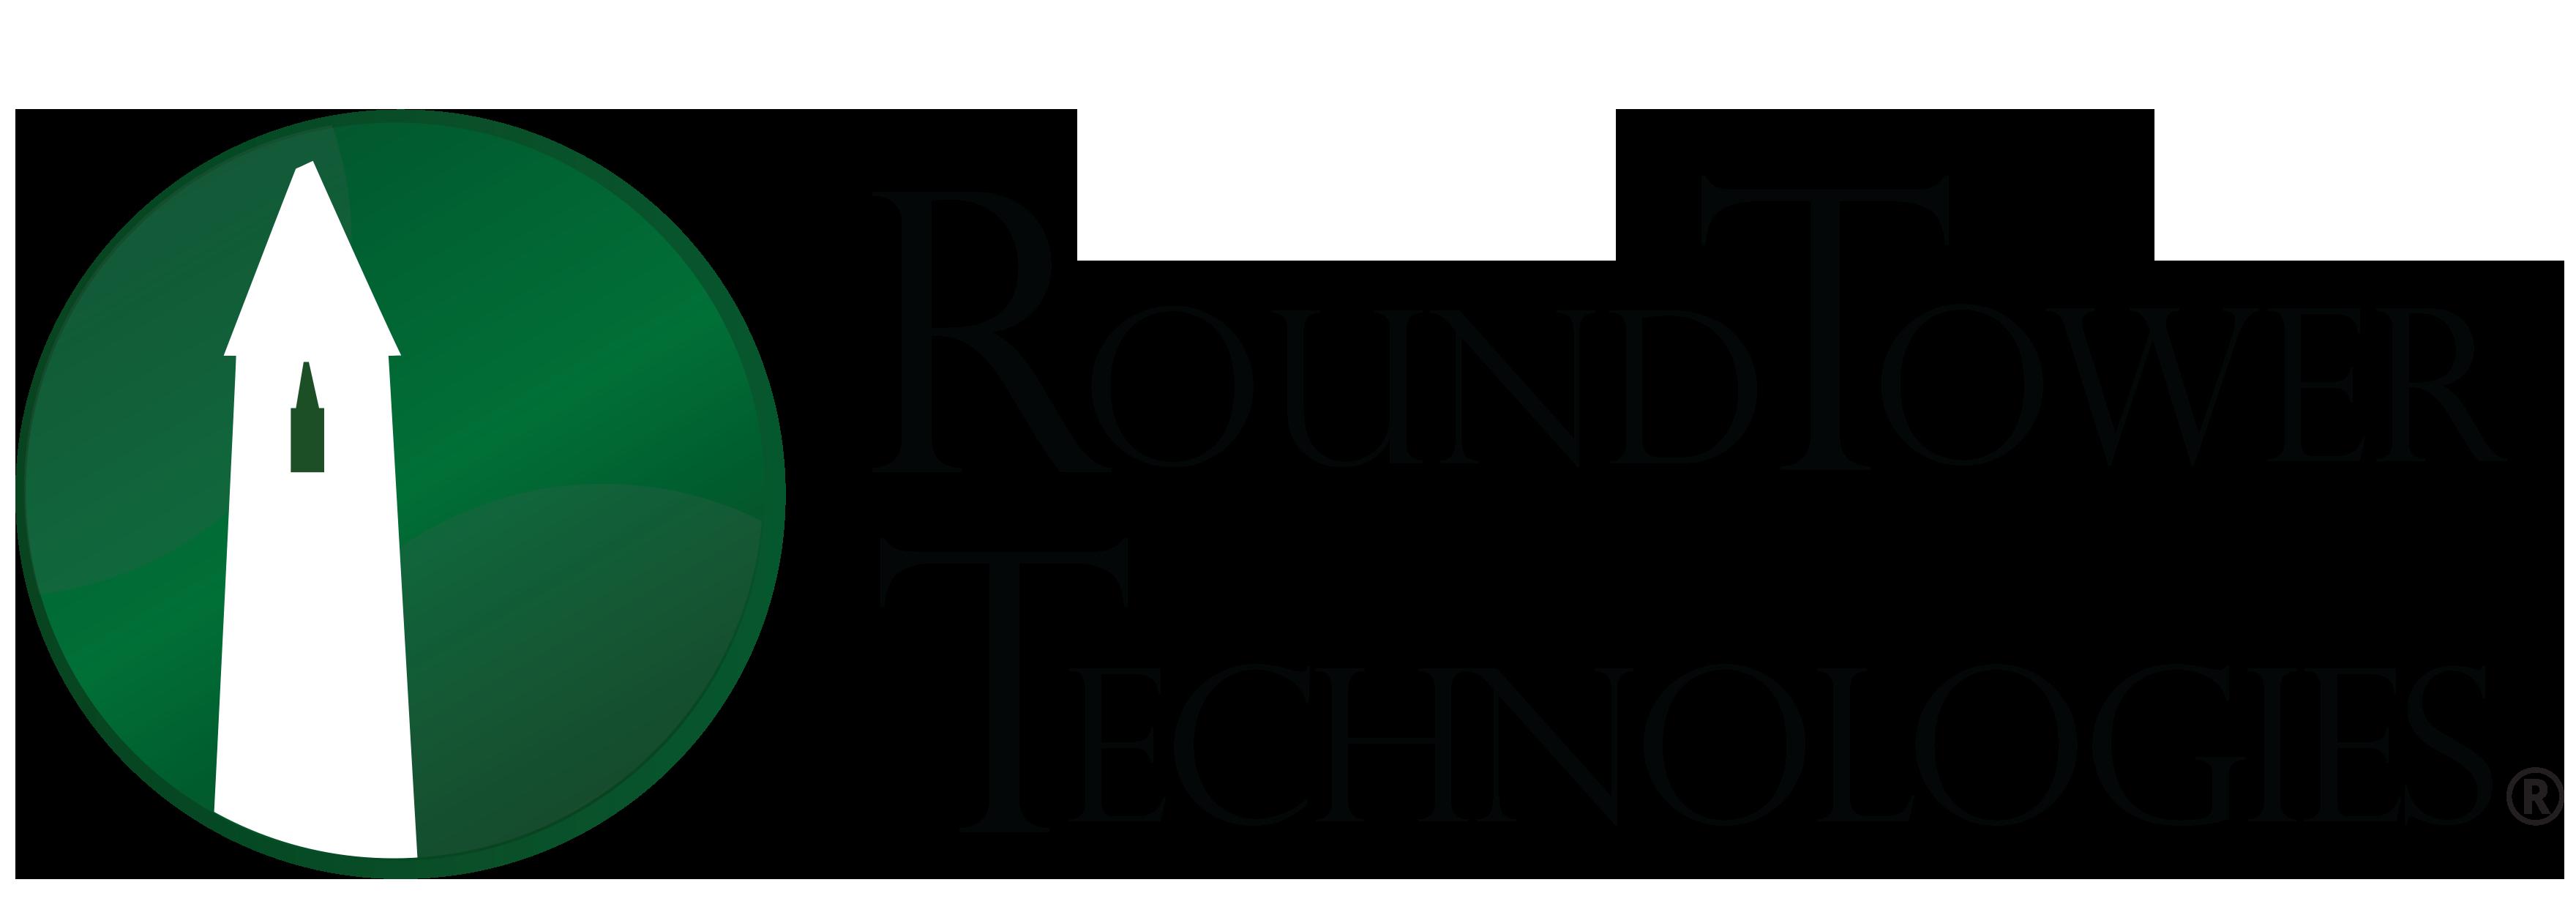 roundtower-technologies-logo-hd